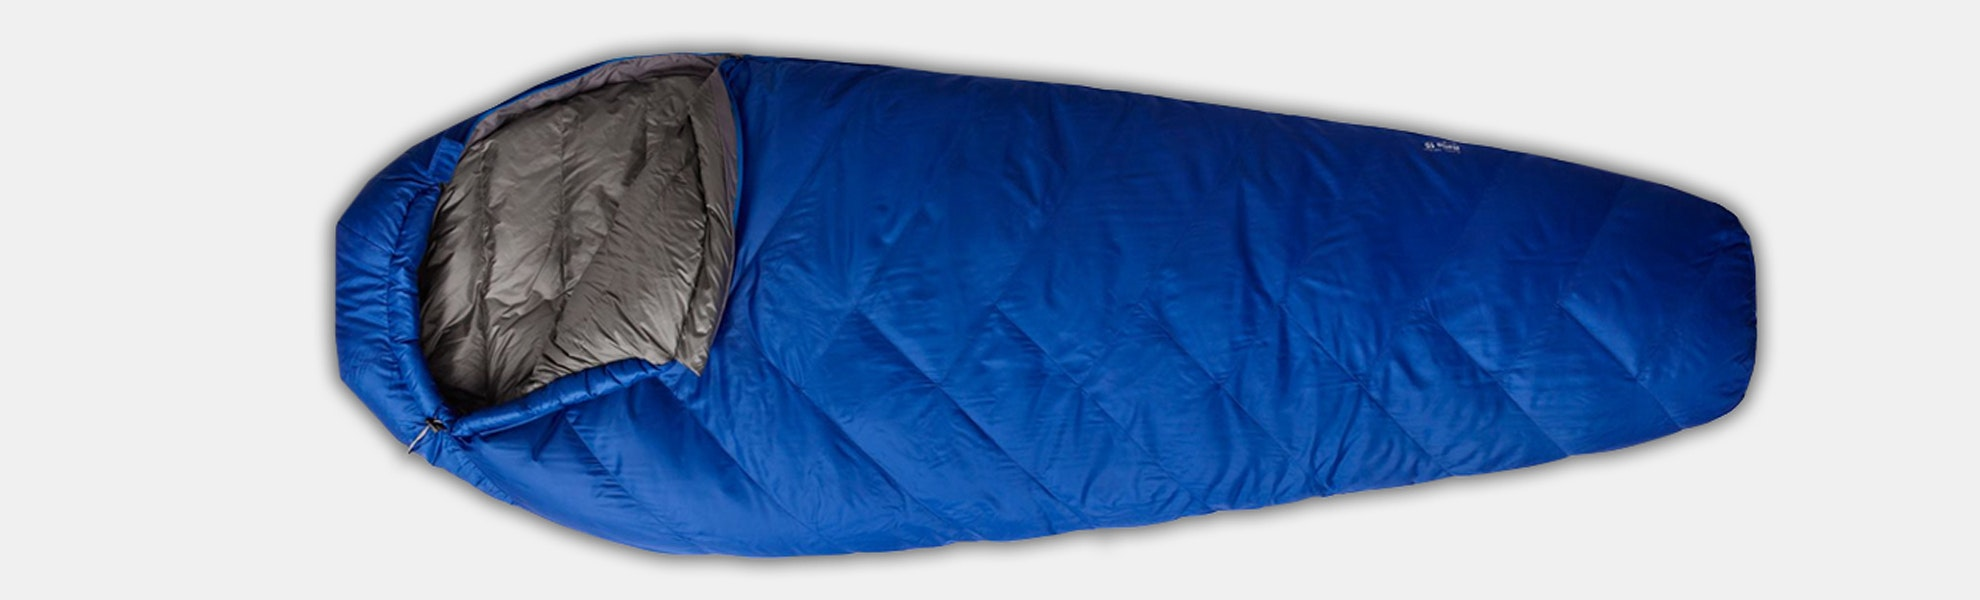 Mountain Hardwear Ratio & Heratio Sleeping Bags